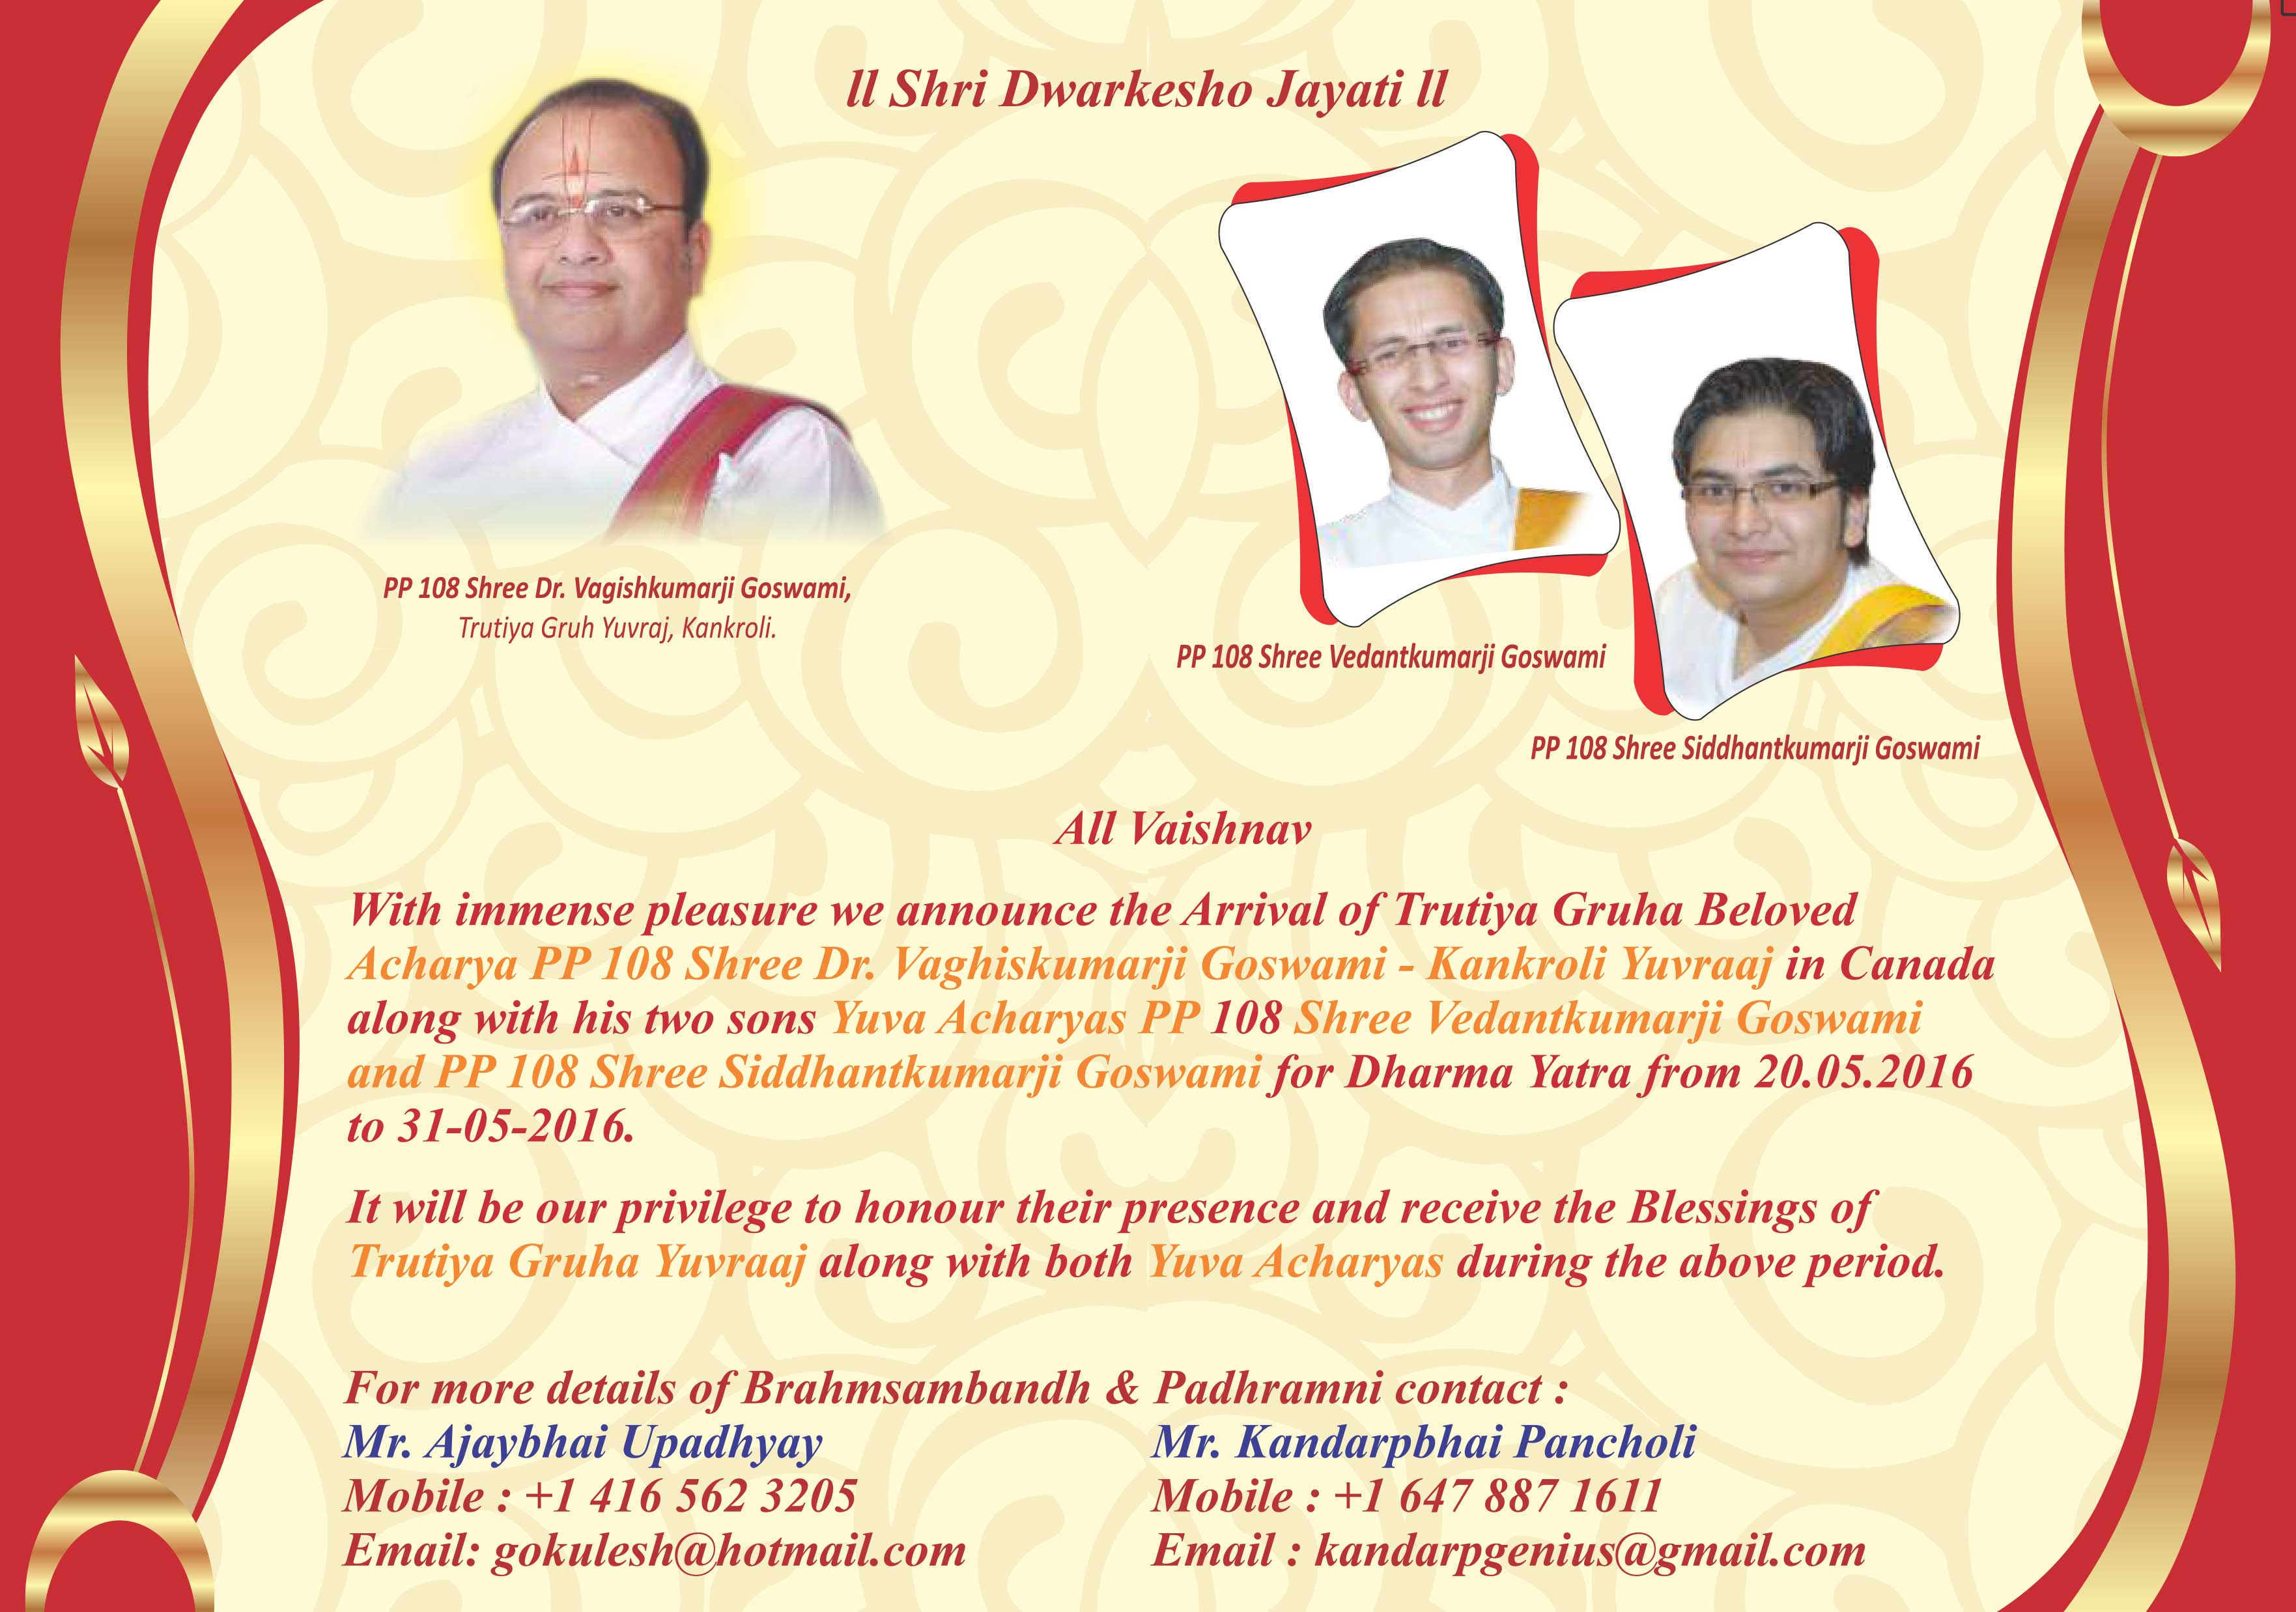 Vagishkumarji Goswami, Siddhantkumarji Goswami, VedantKumarji Goswami